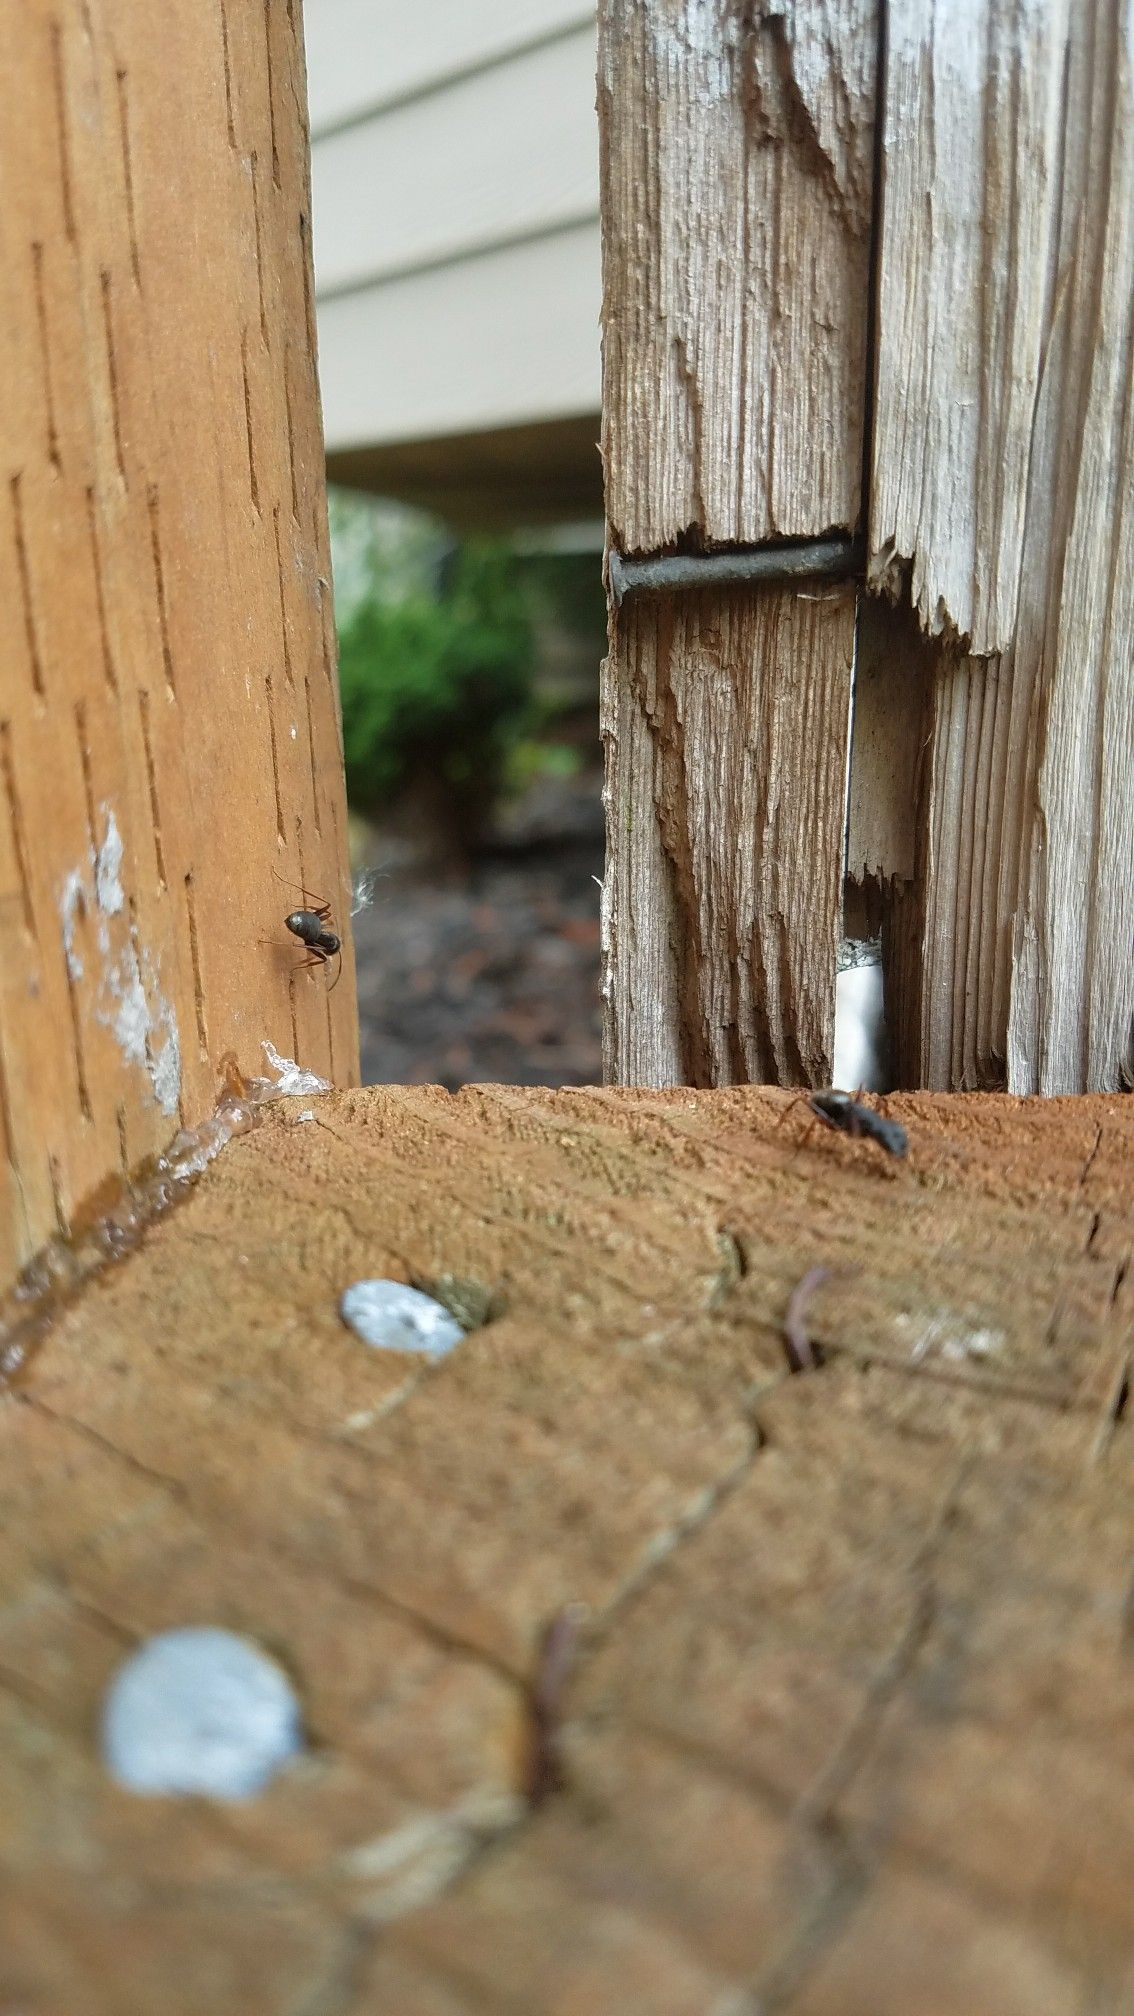 Carpenter ants problems Bellevue Ant problem, Carpenter